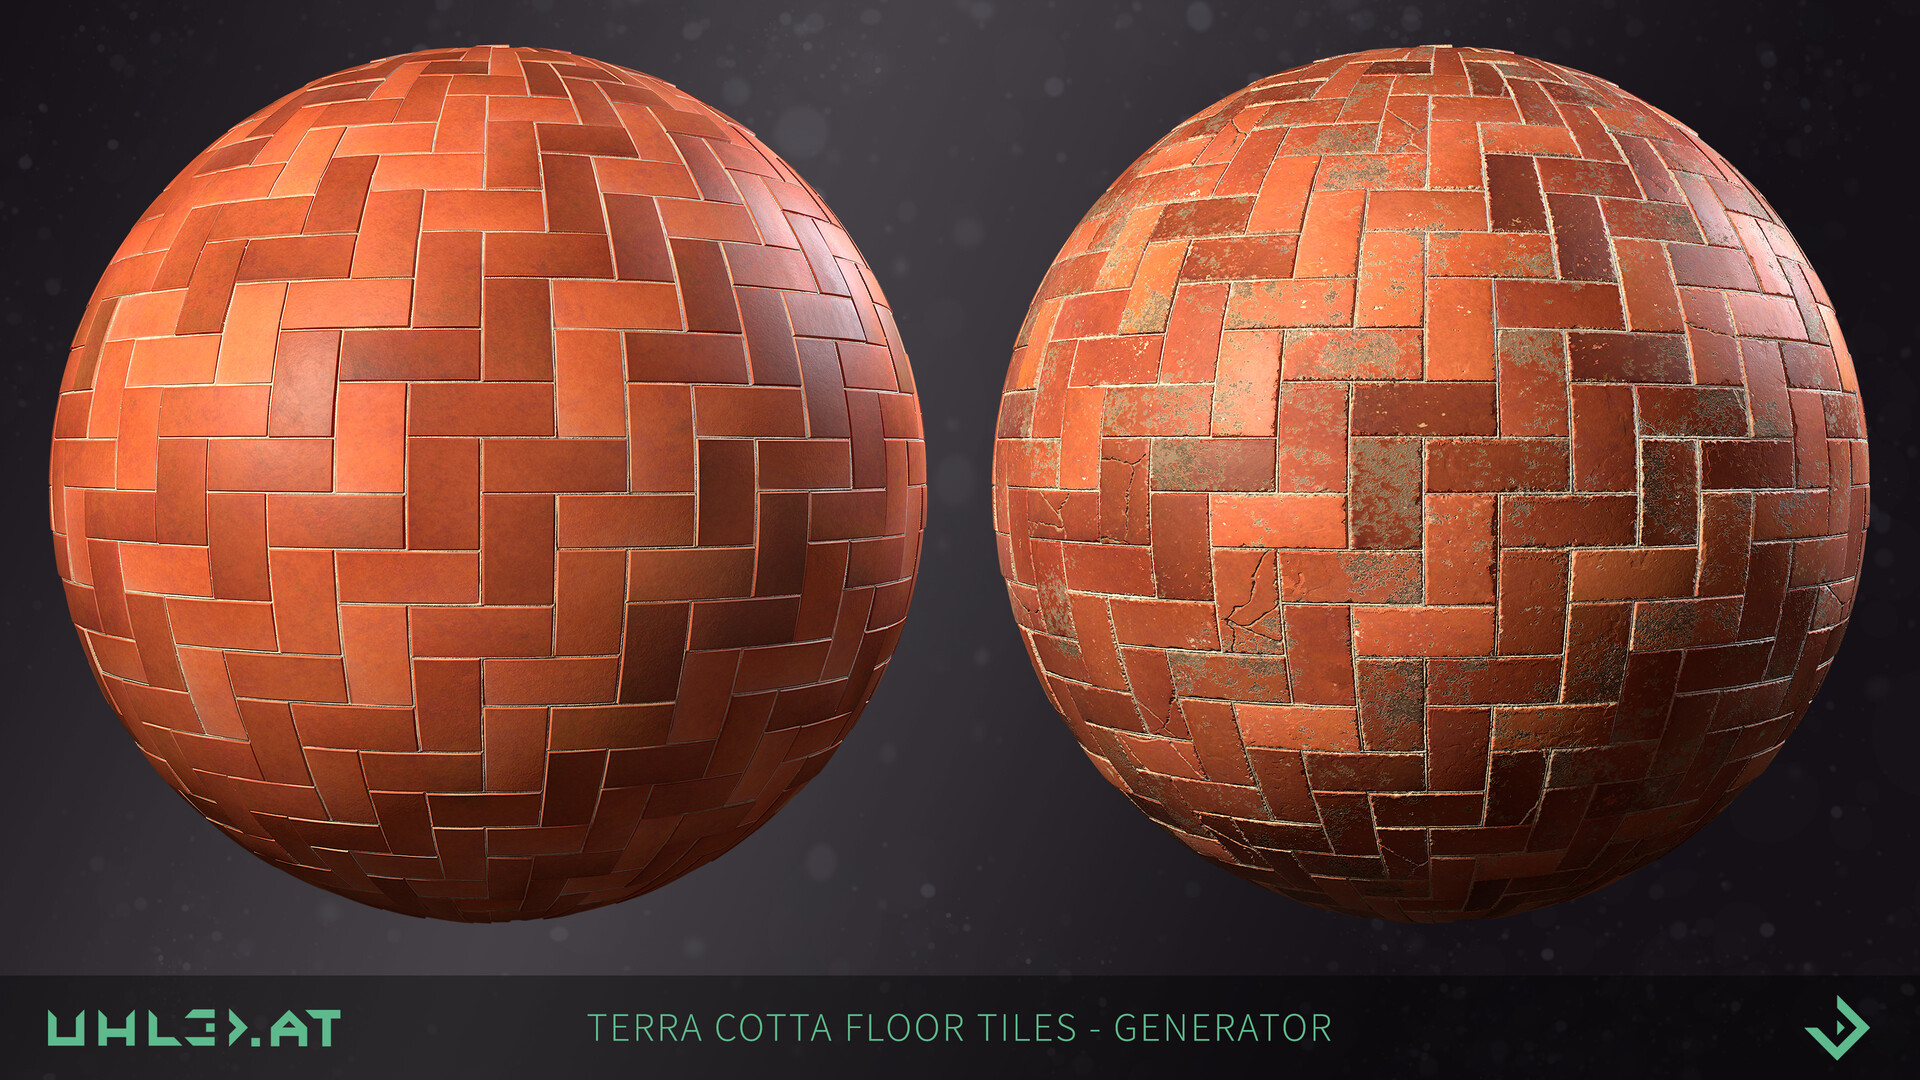 Dominik uhl terracottafloor generator pattern 06